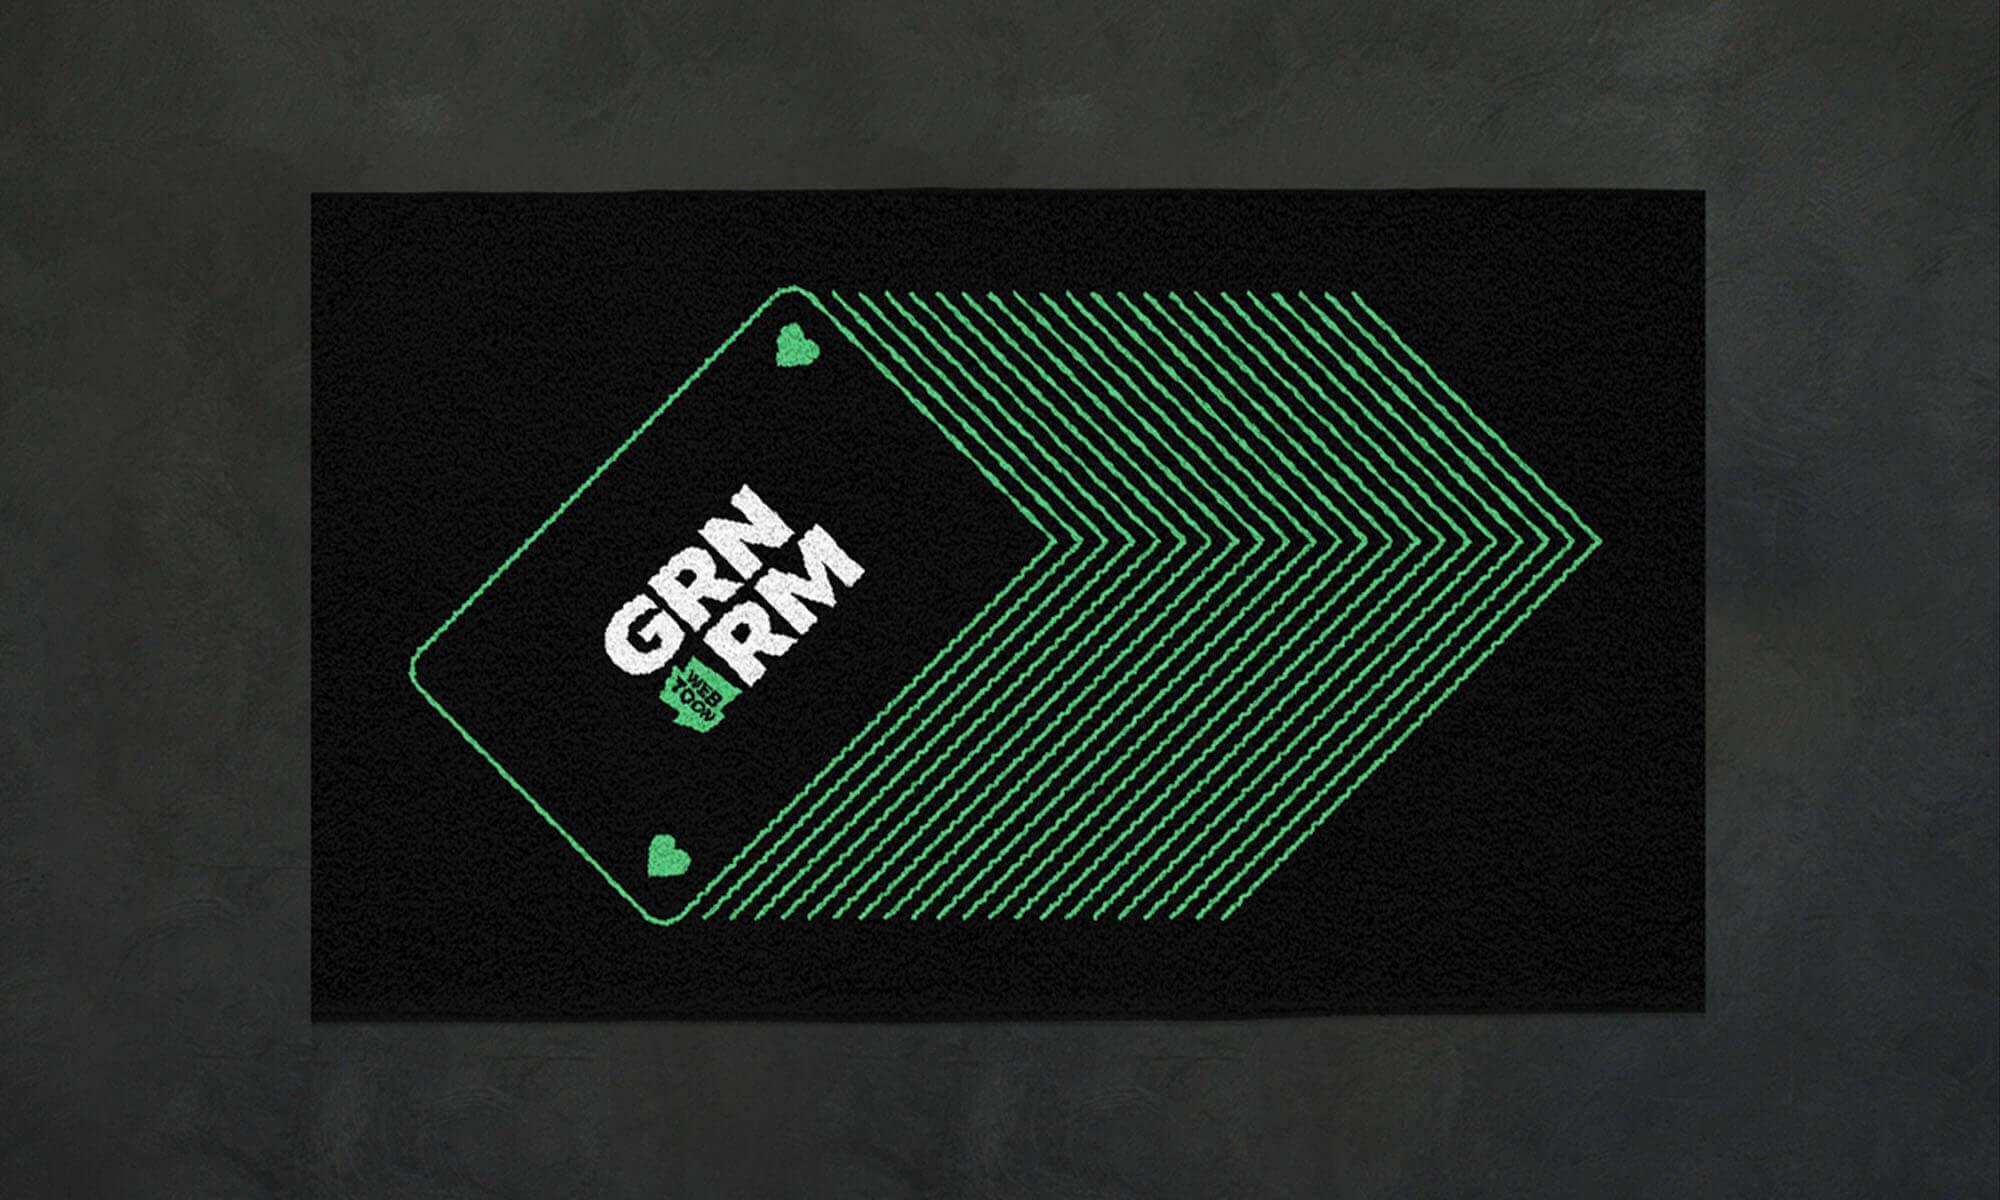 studio-malagon-green-room-rug